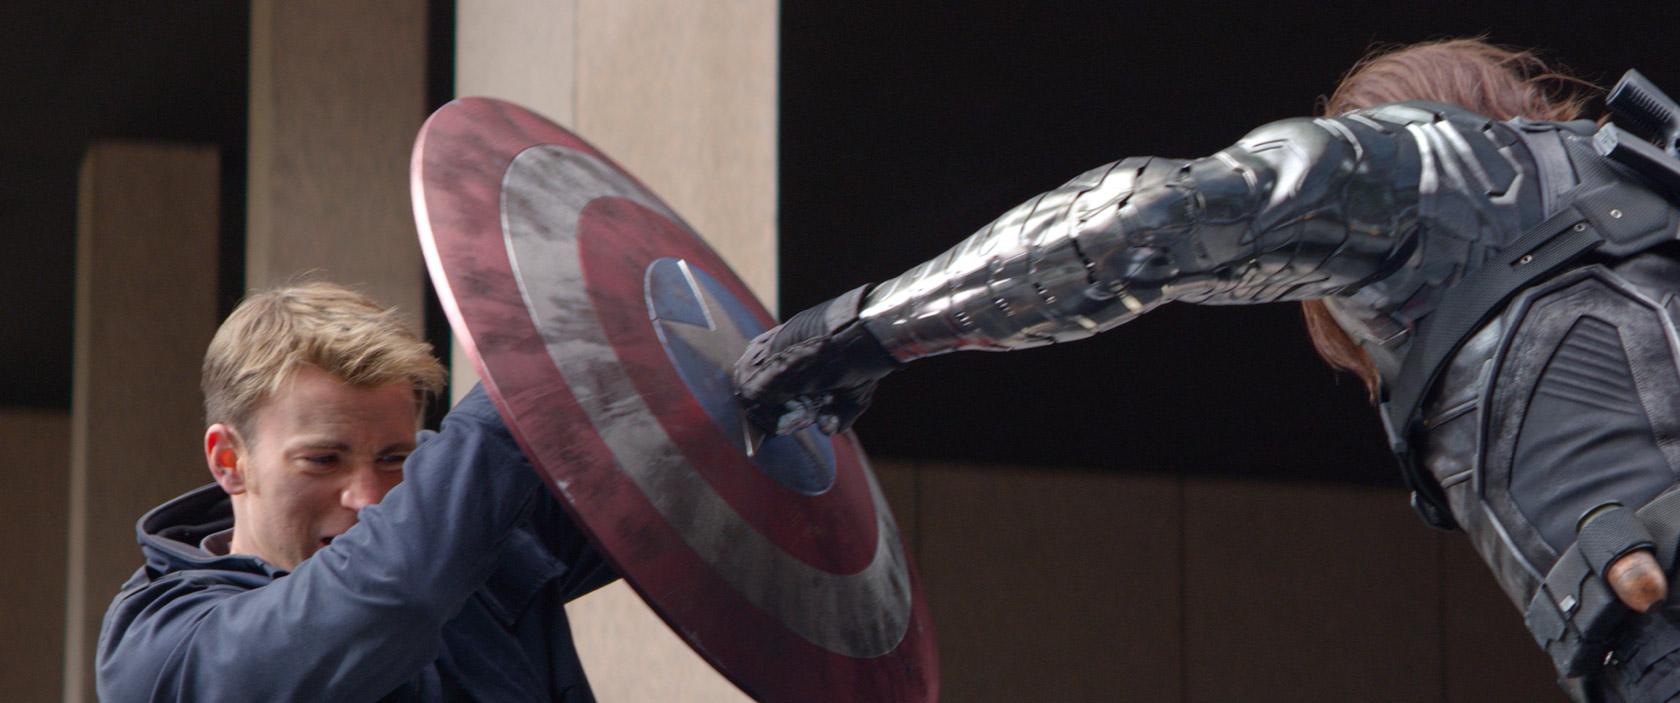 Cap America vs Winter Soldier